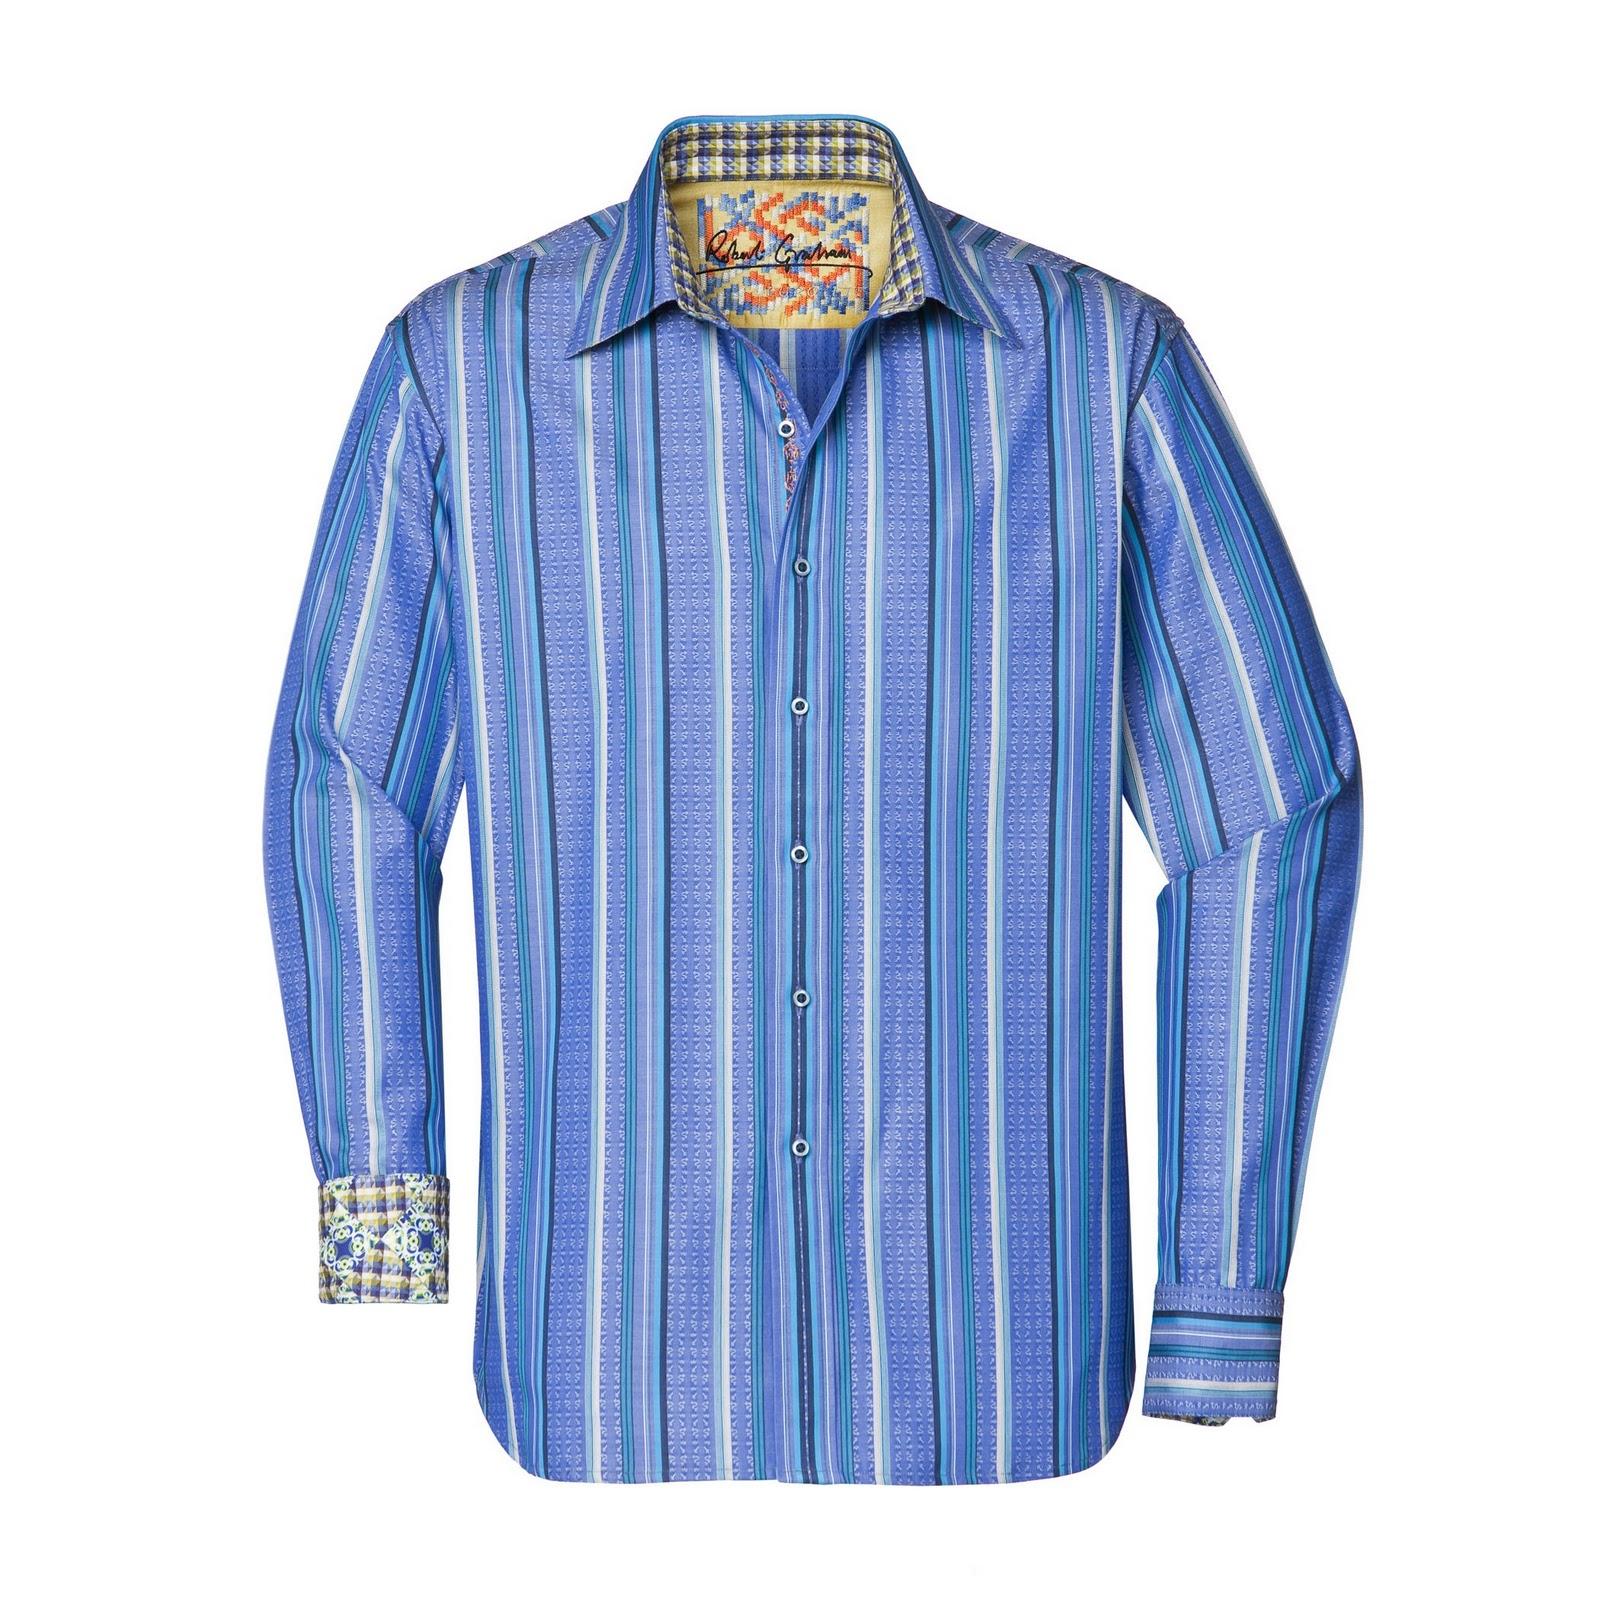 Best shirt design joy studio design gallery best design - Design Of Gents Shirts Joy Studio Design Gallery Best Design